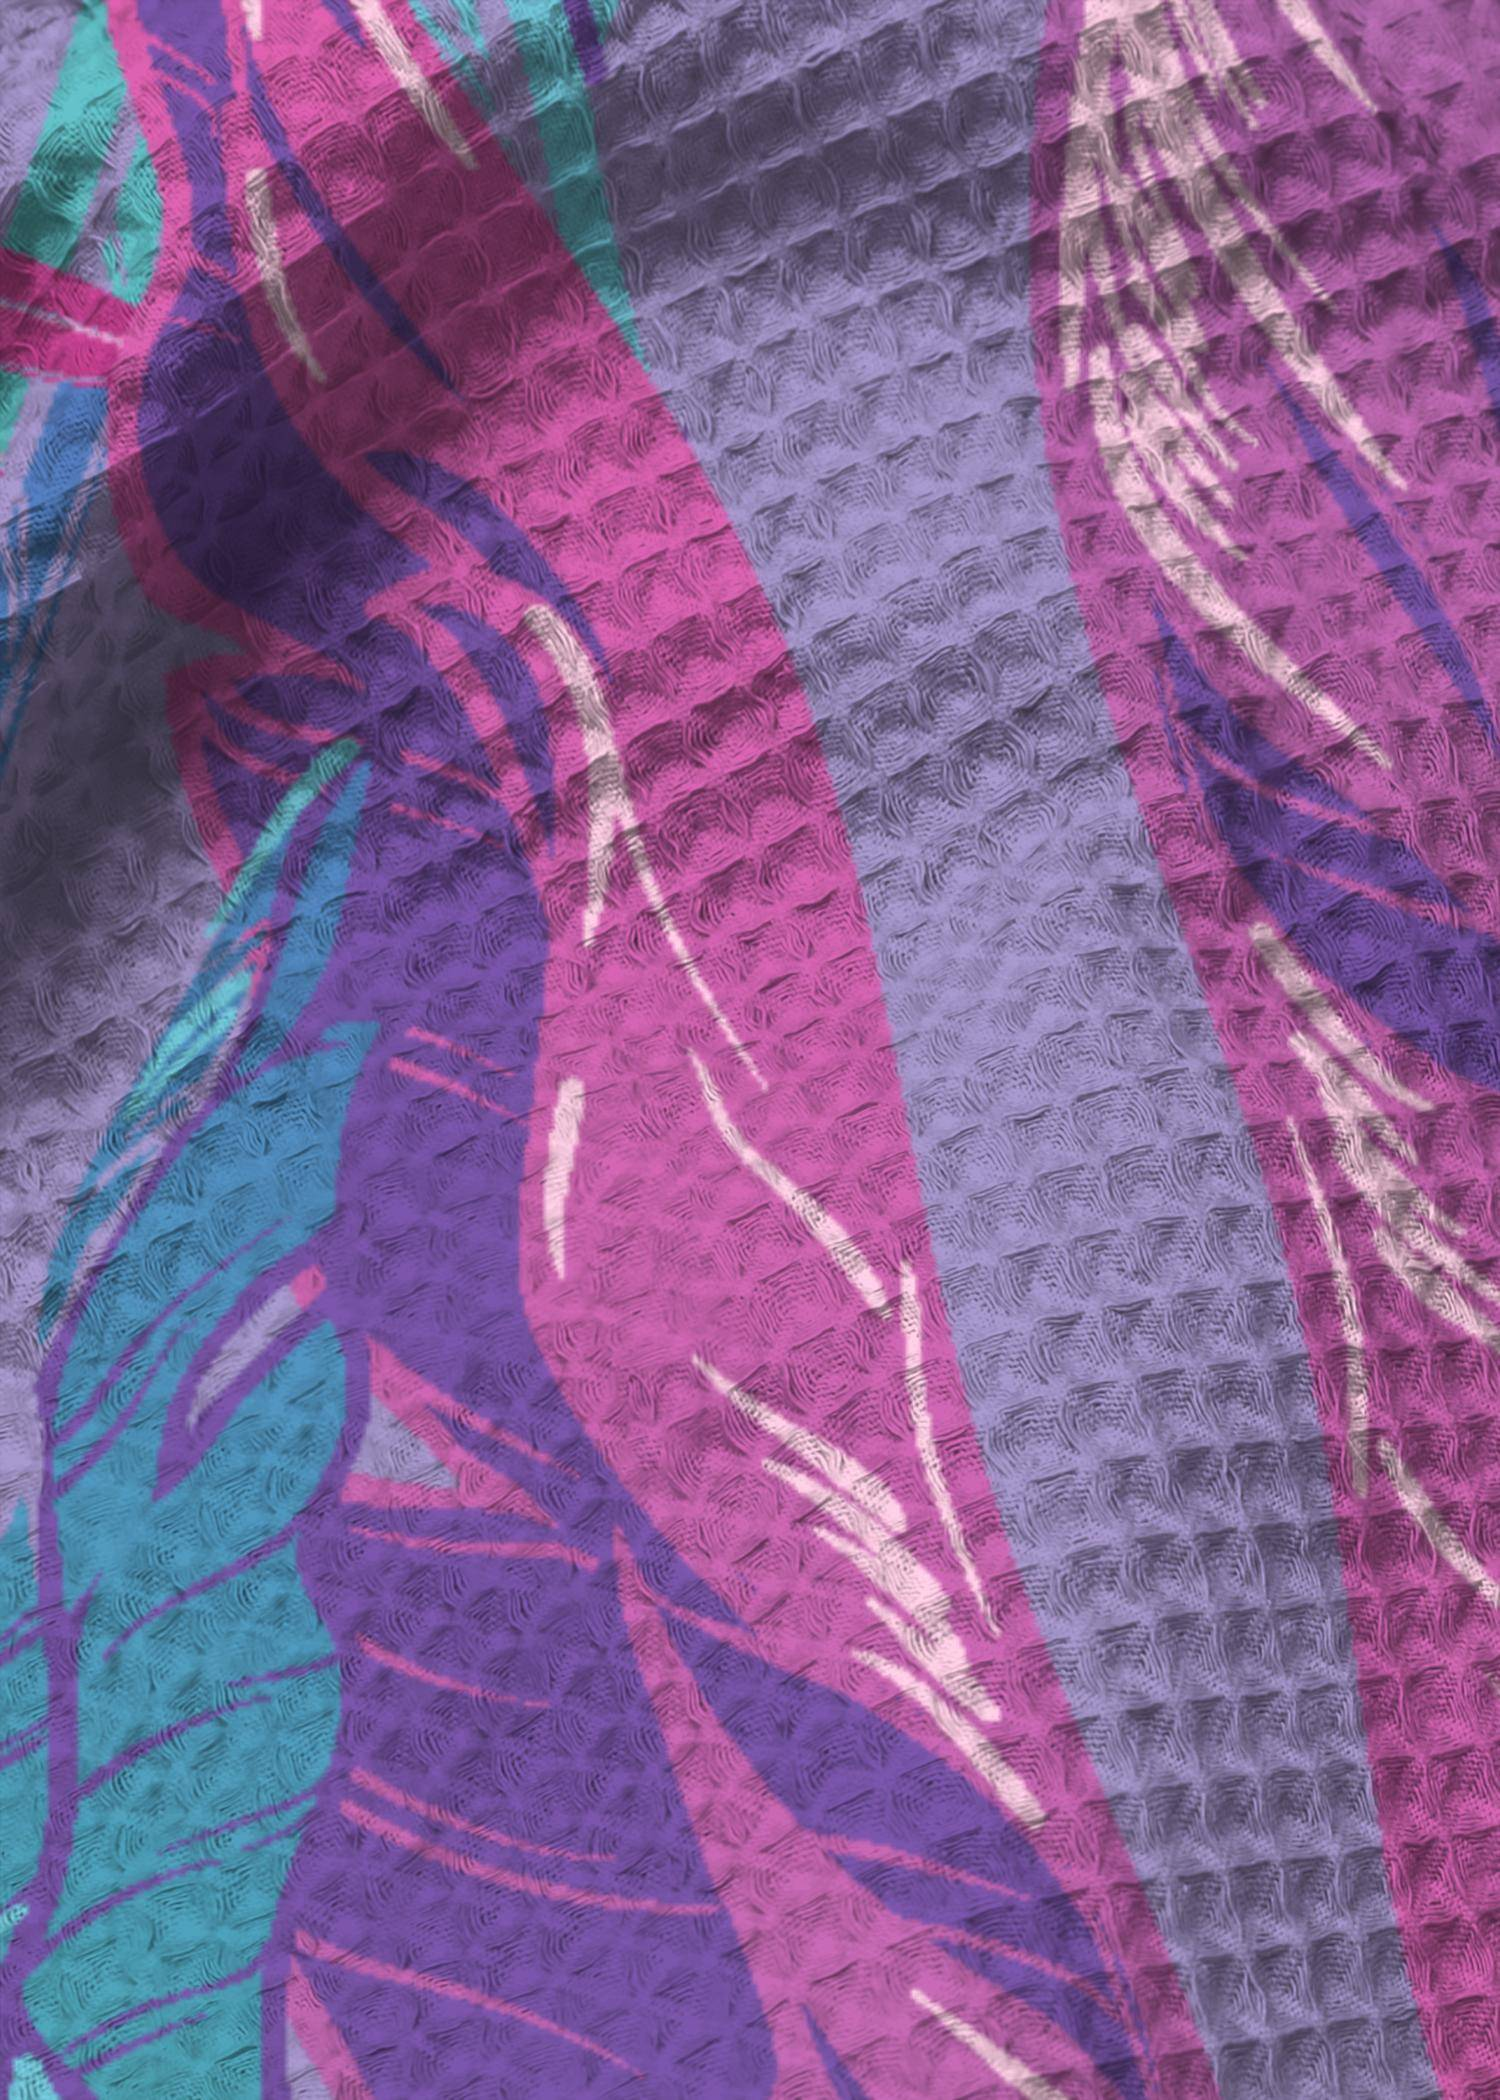 VIDA Tea Towel Set of 2 - Dahlia Garden In Violet by VIDA Original Artist  - Size: Waffle set